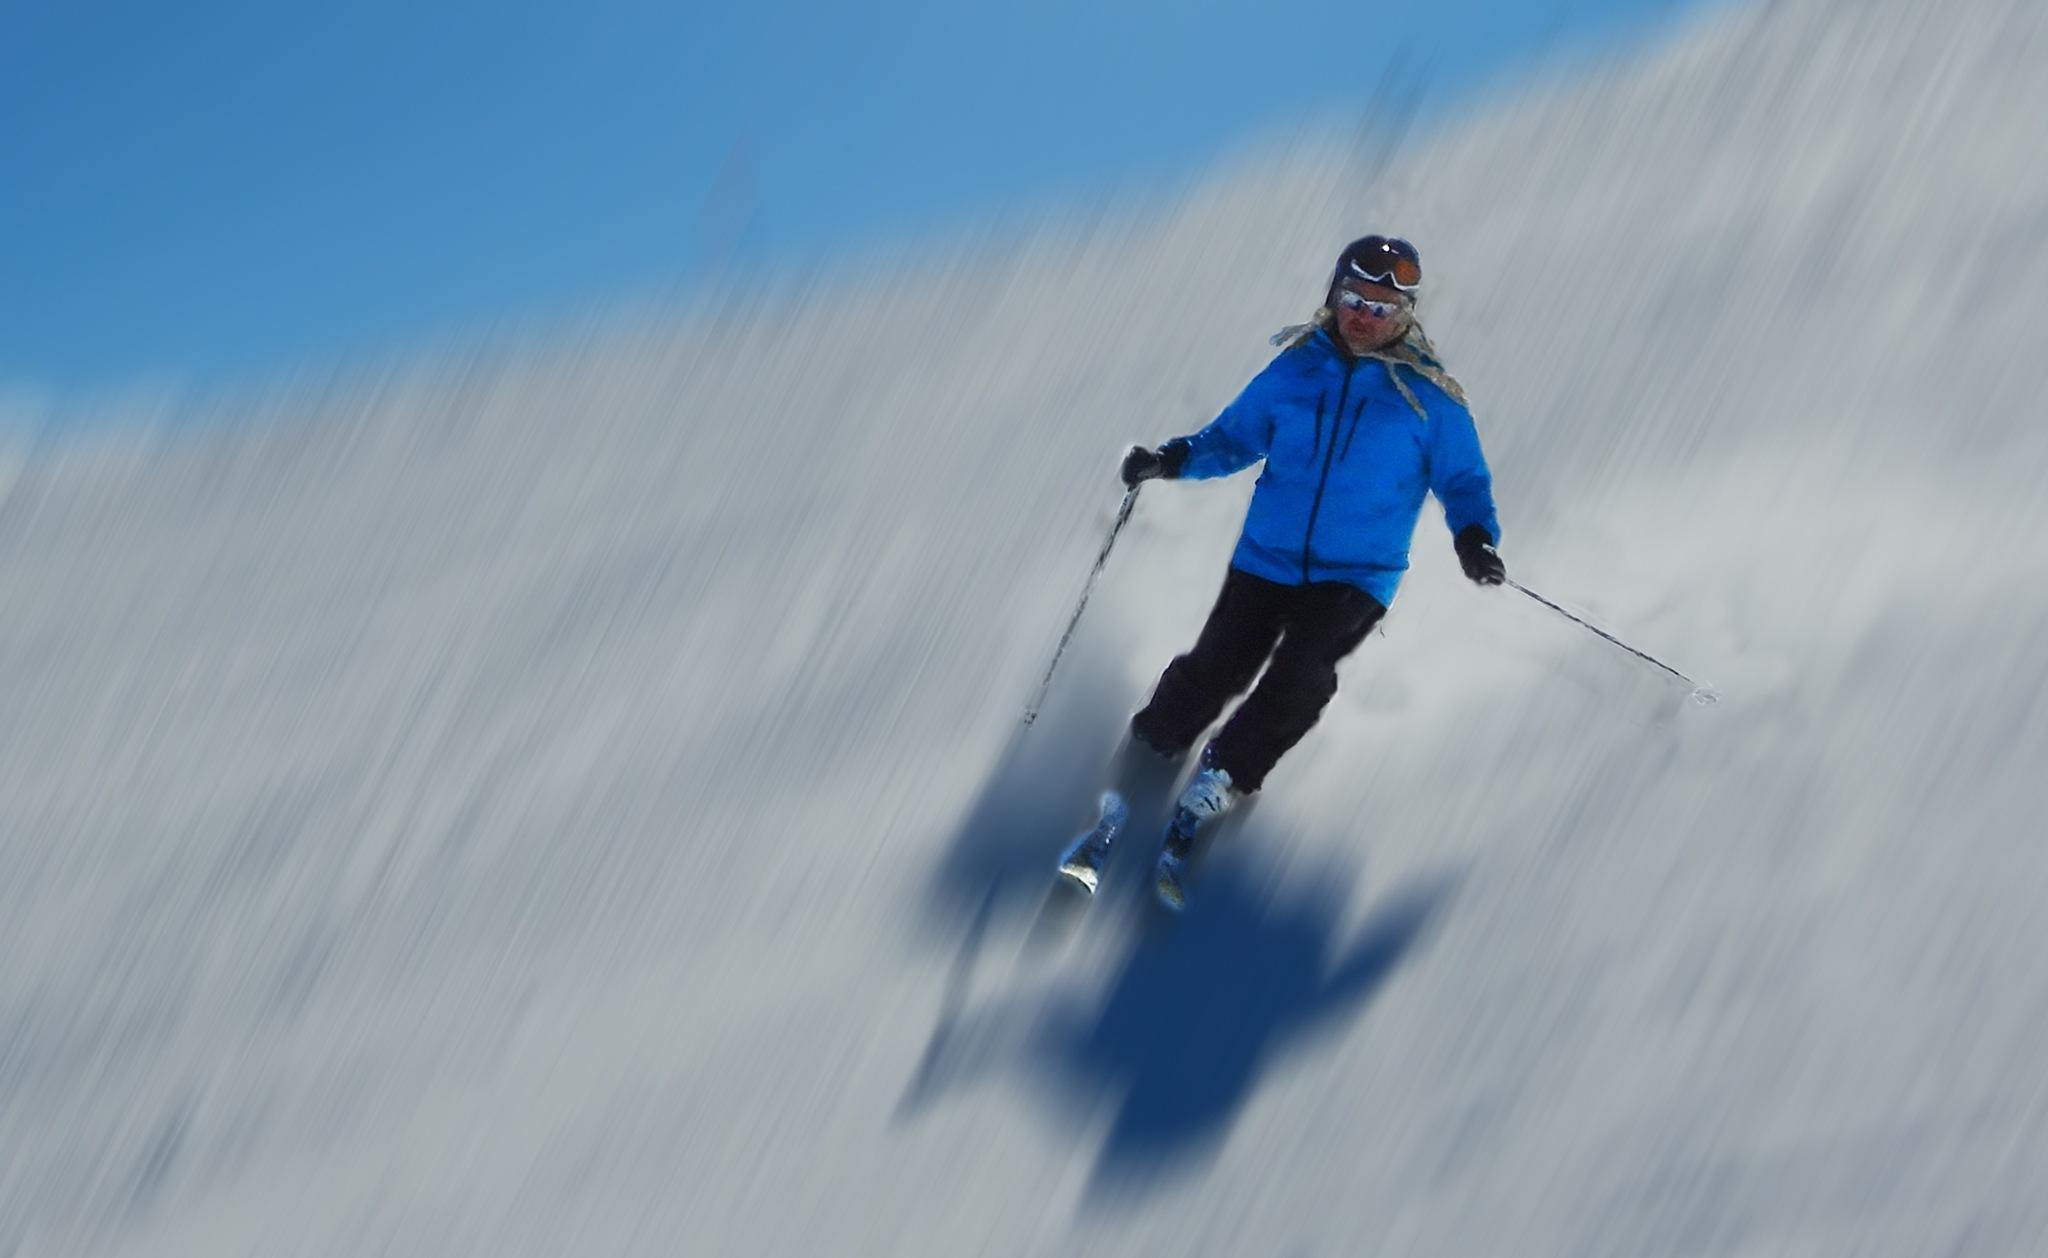 fast skier by sunrisesunset